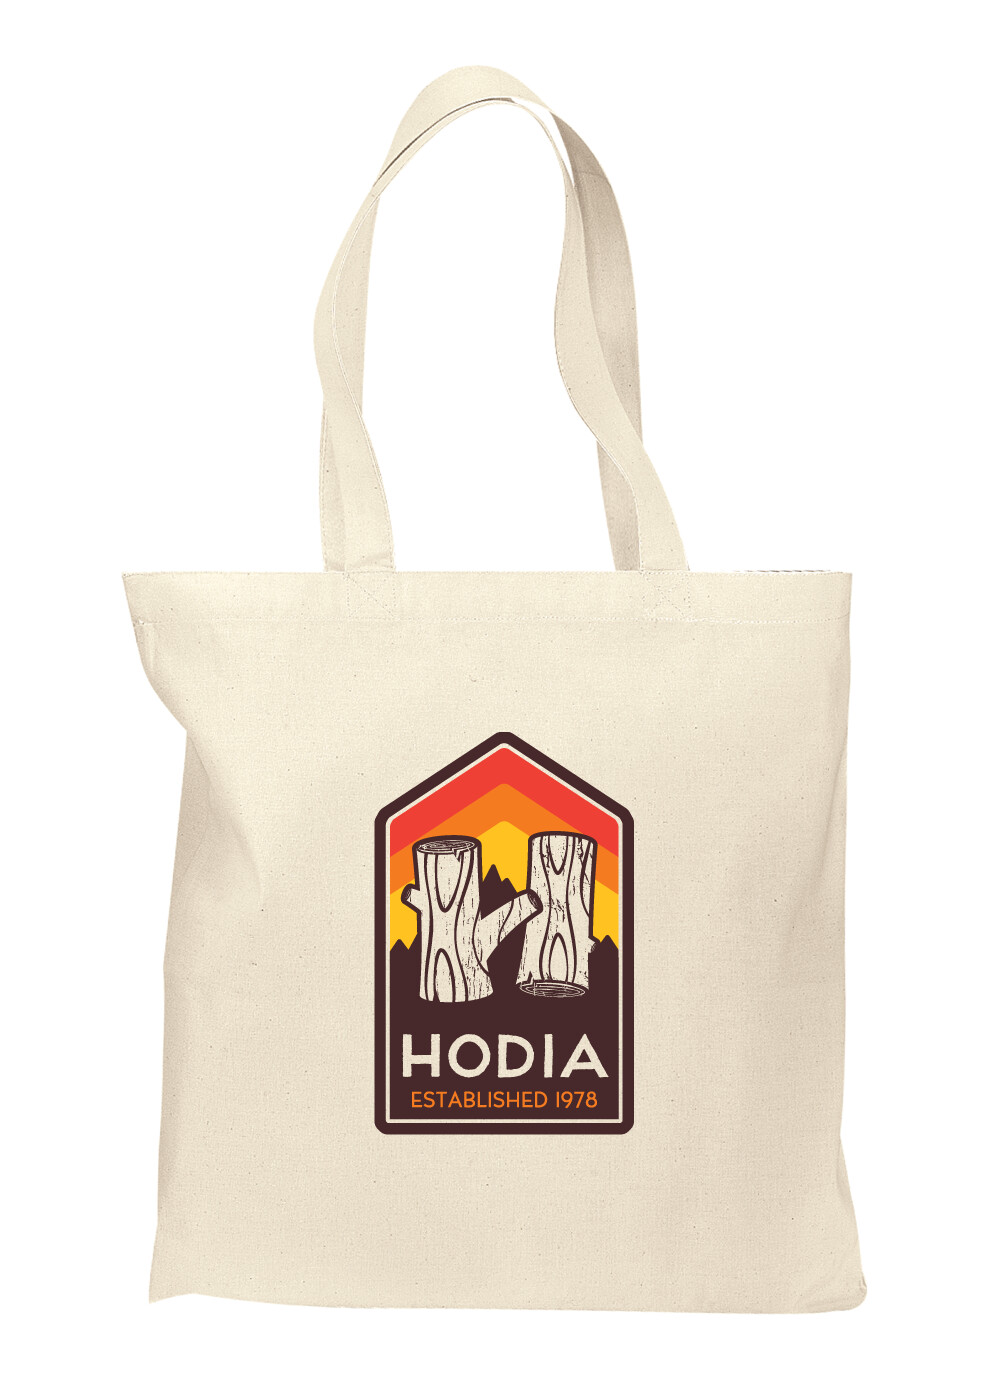 Hodia Reusable Tote